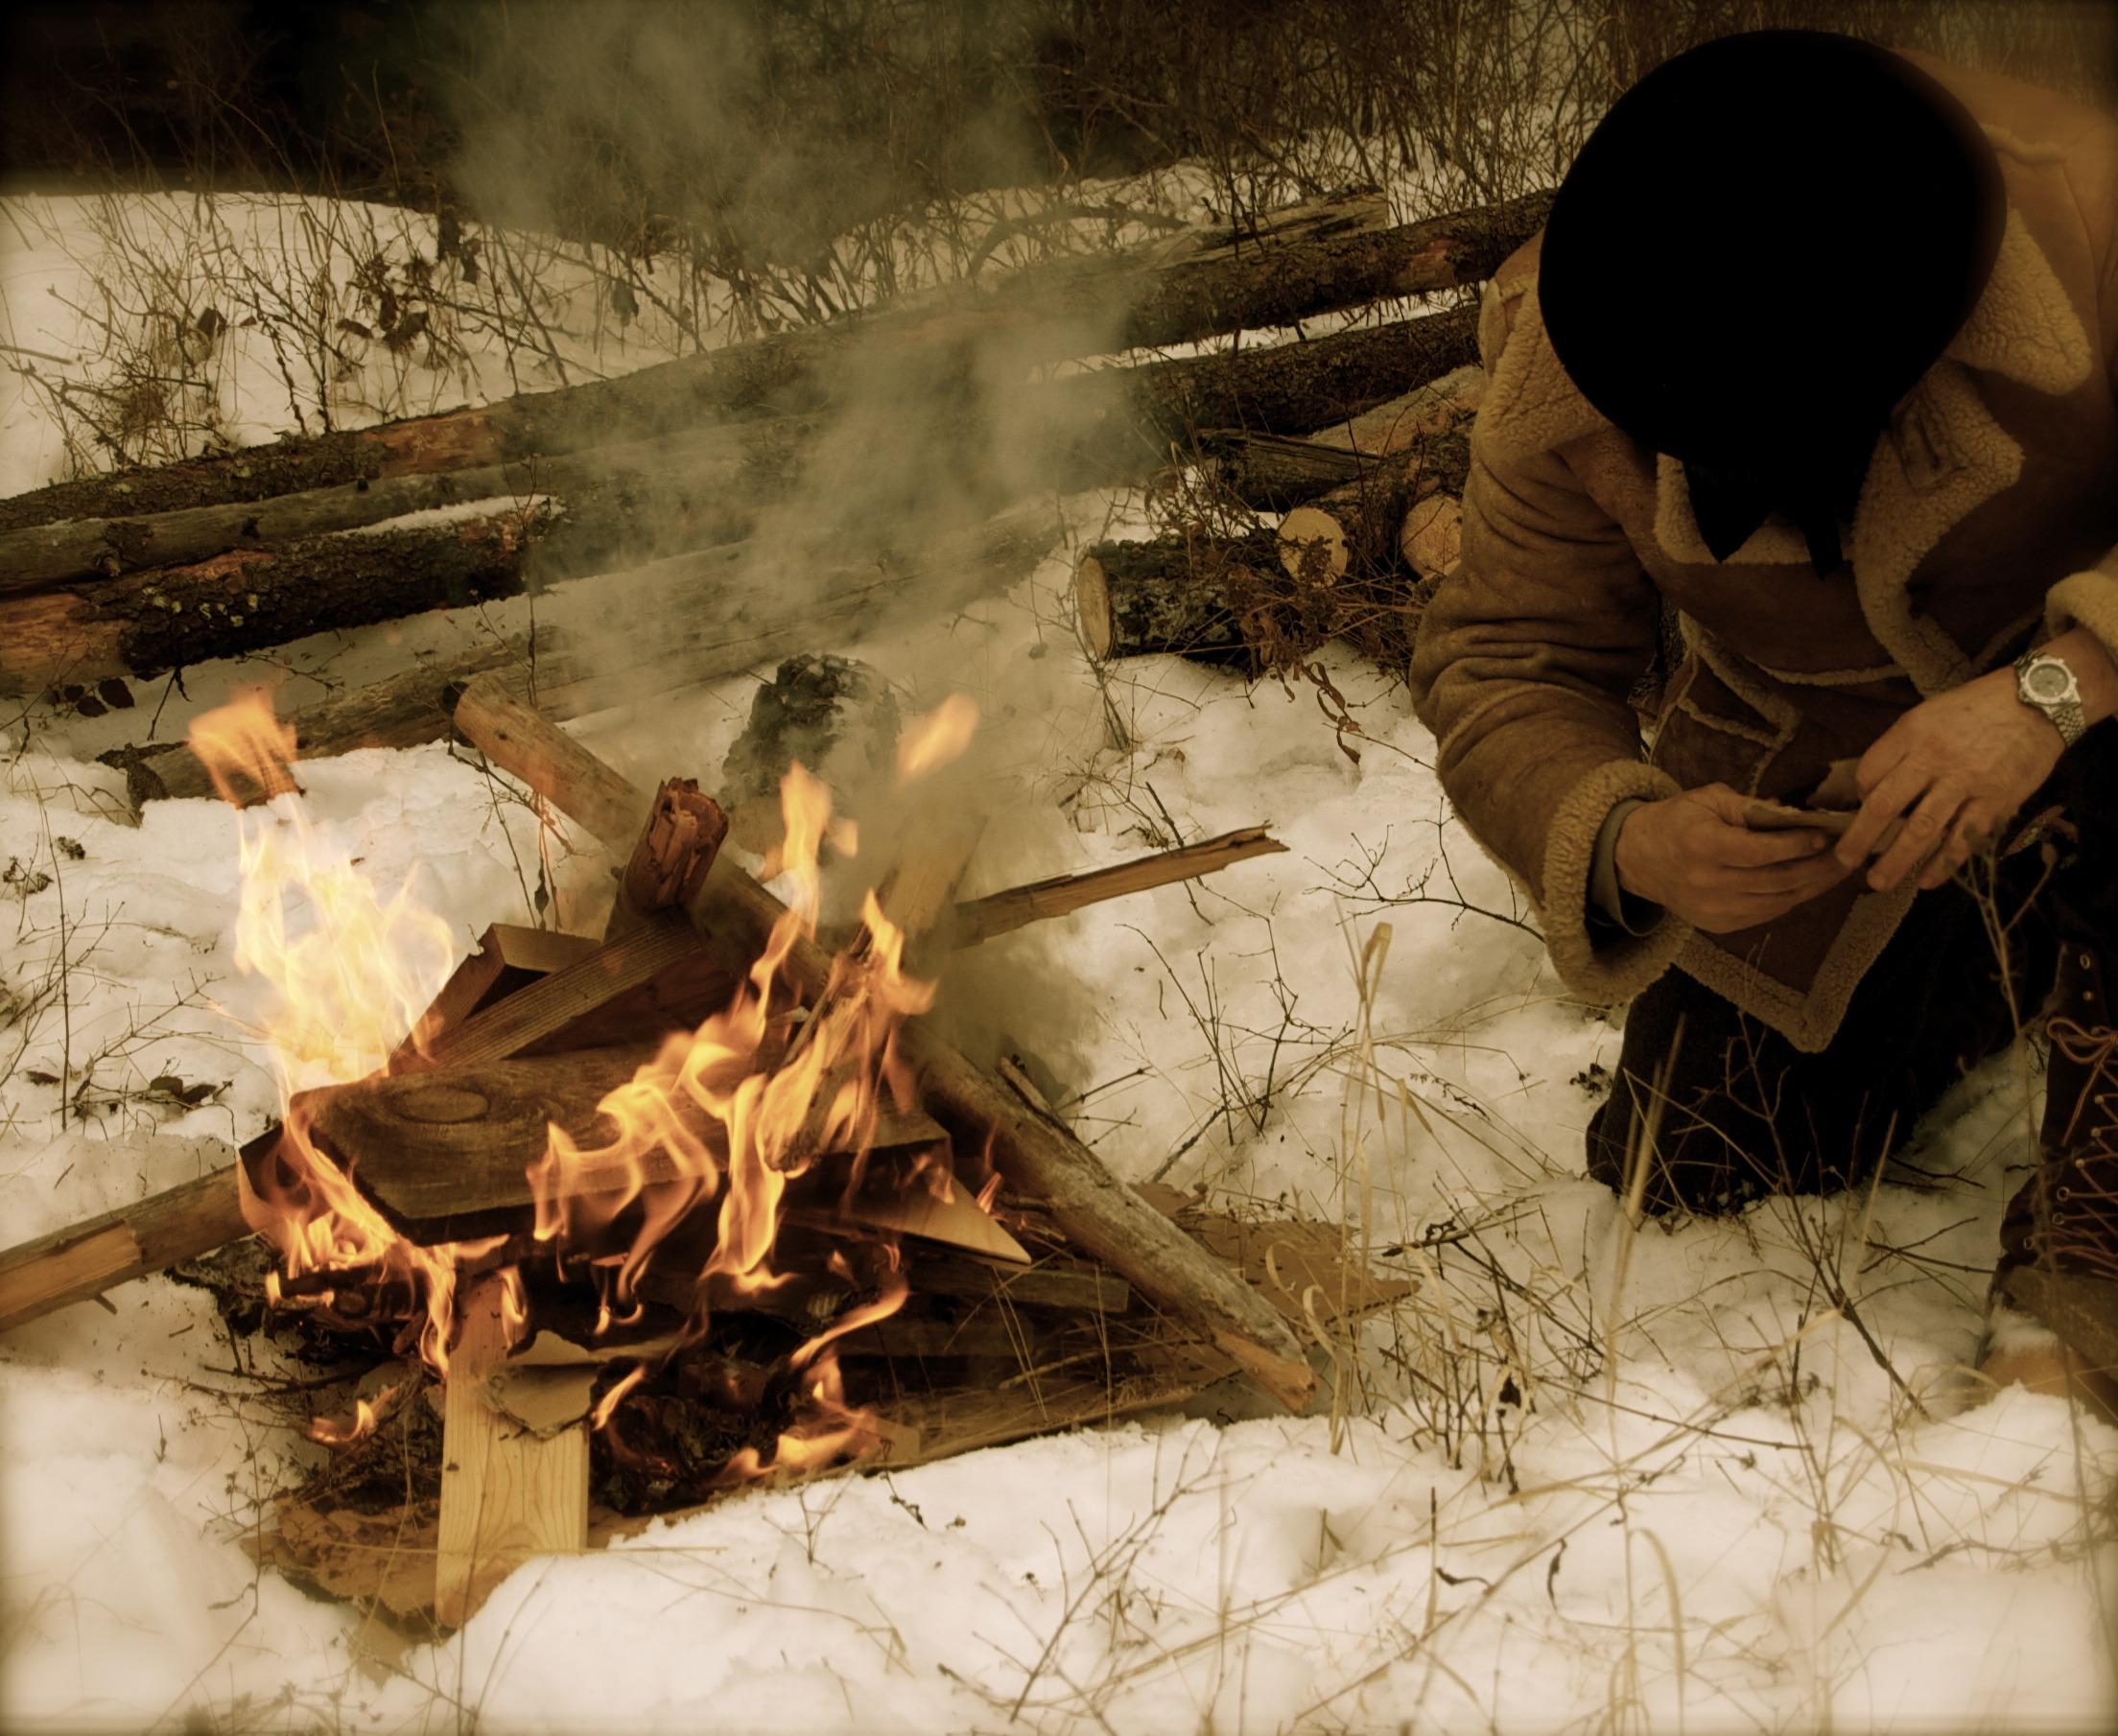 To build a fire man vs nature essay